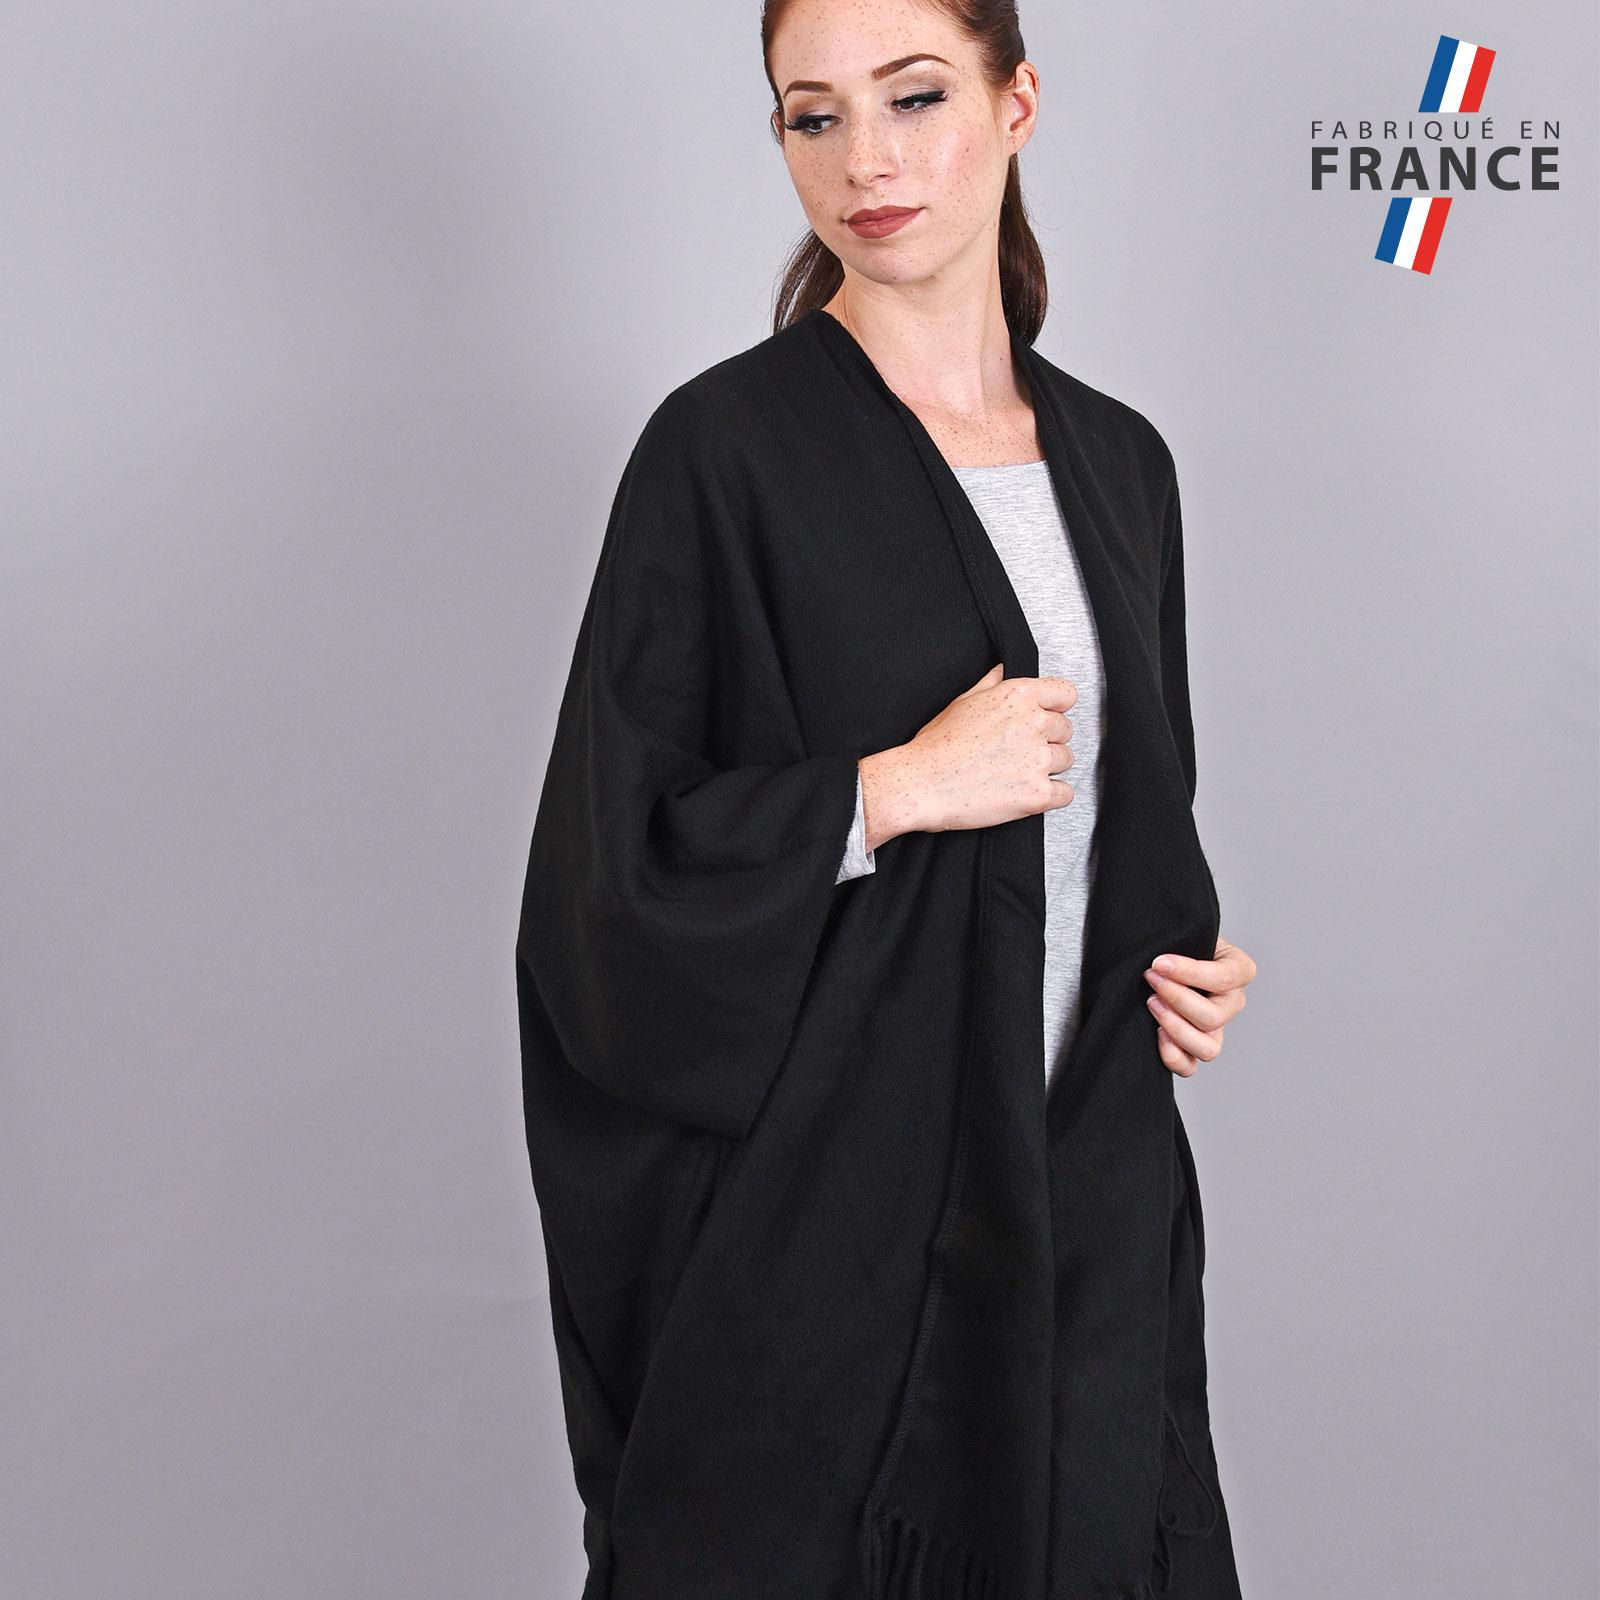 AT-03989-VF16-2-LB_FR-poncho-femme-hiver-fabrication-france